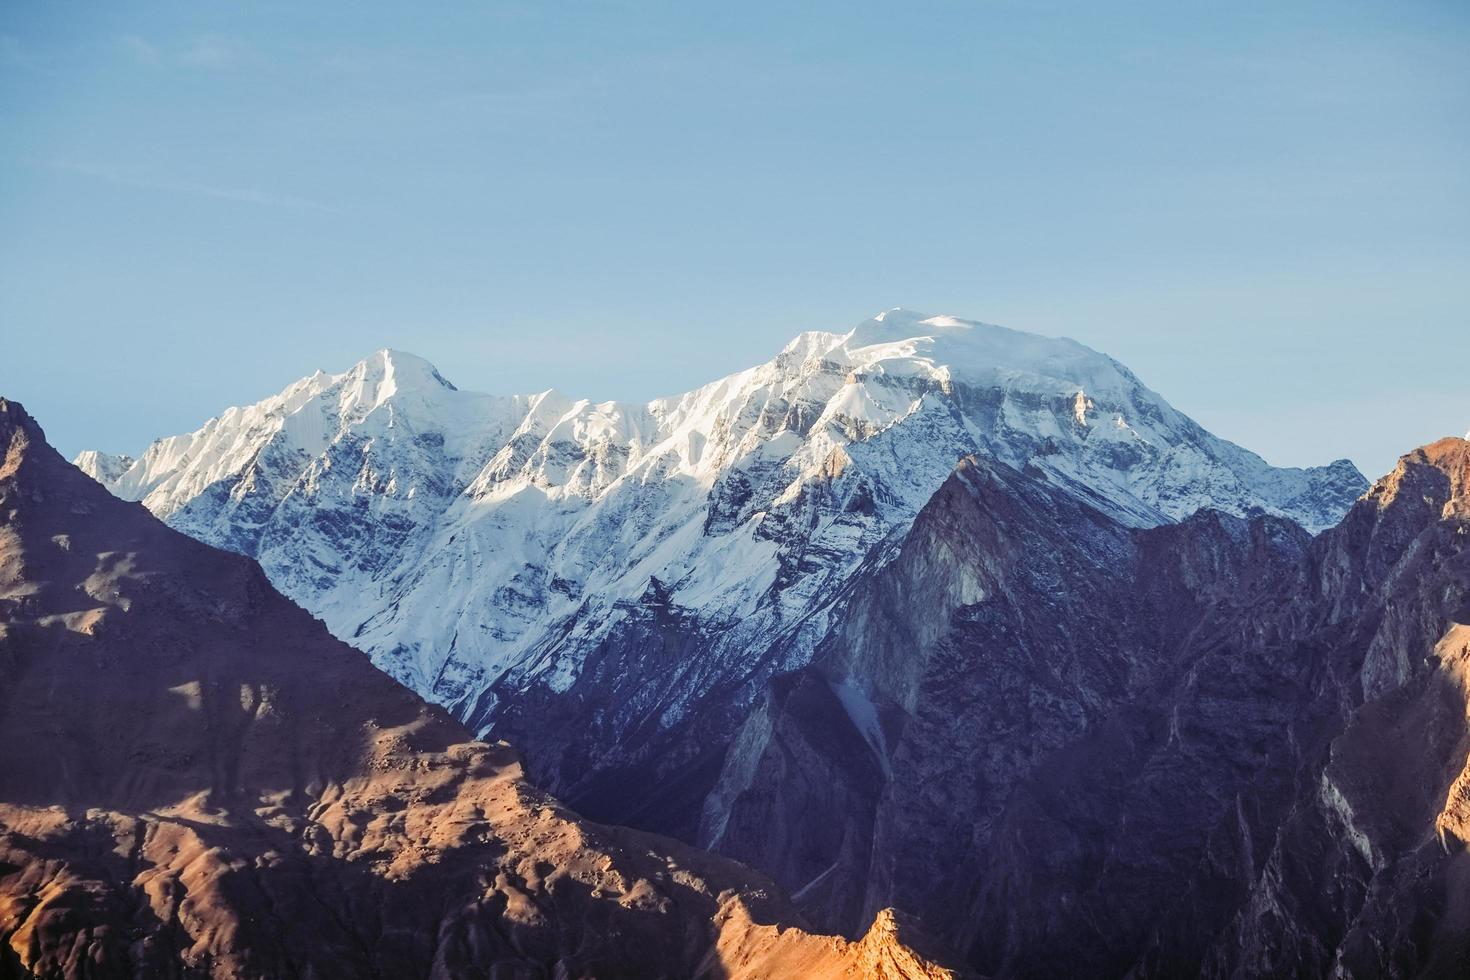 luce del mattino splende sulla montagna innevata foto